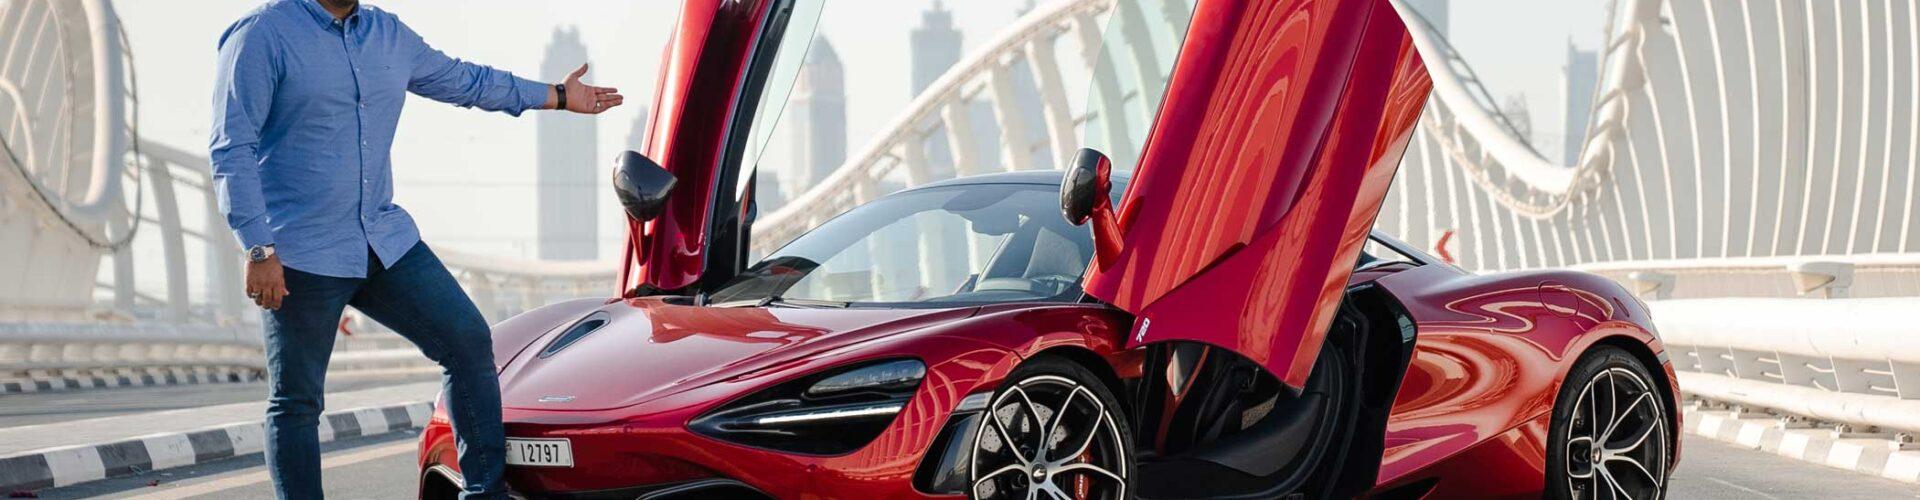 Rent Mercedes in Dubai